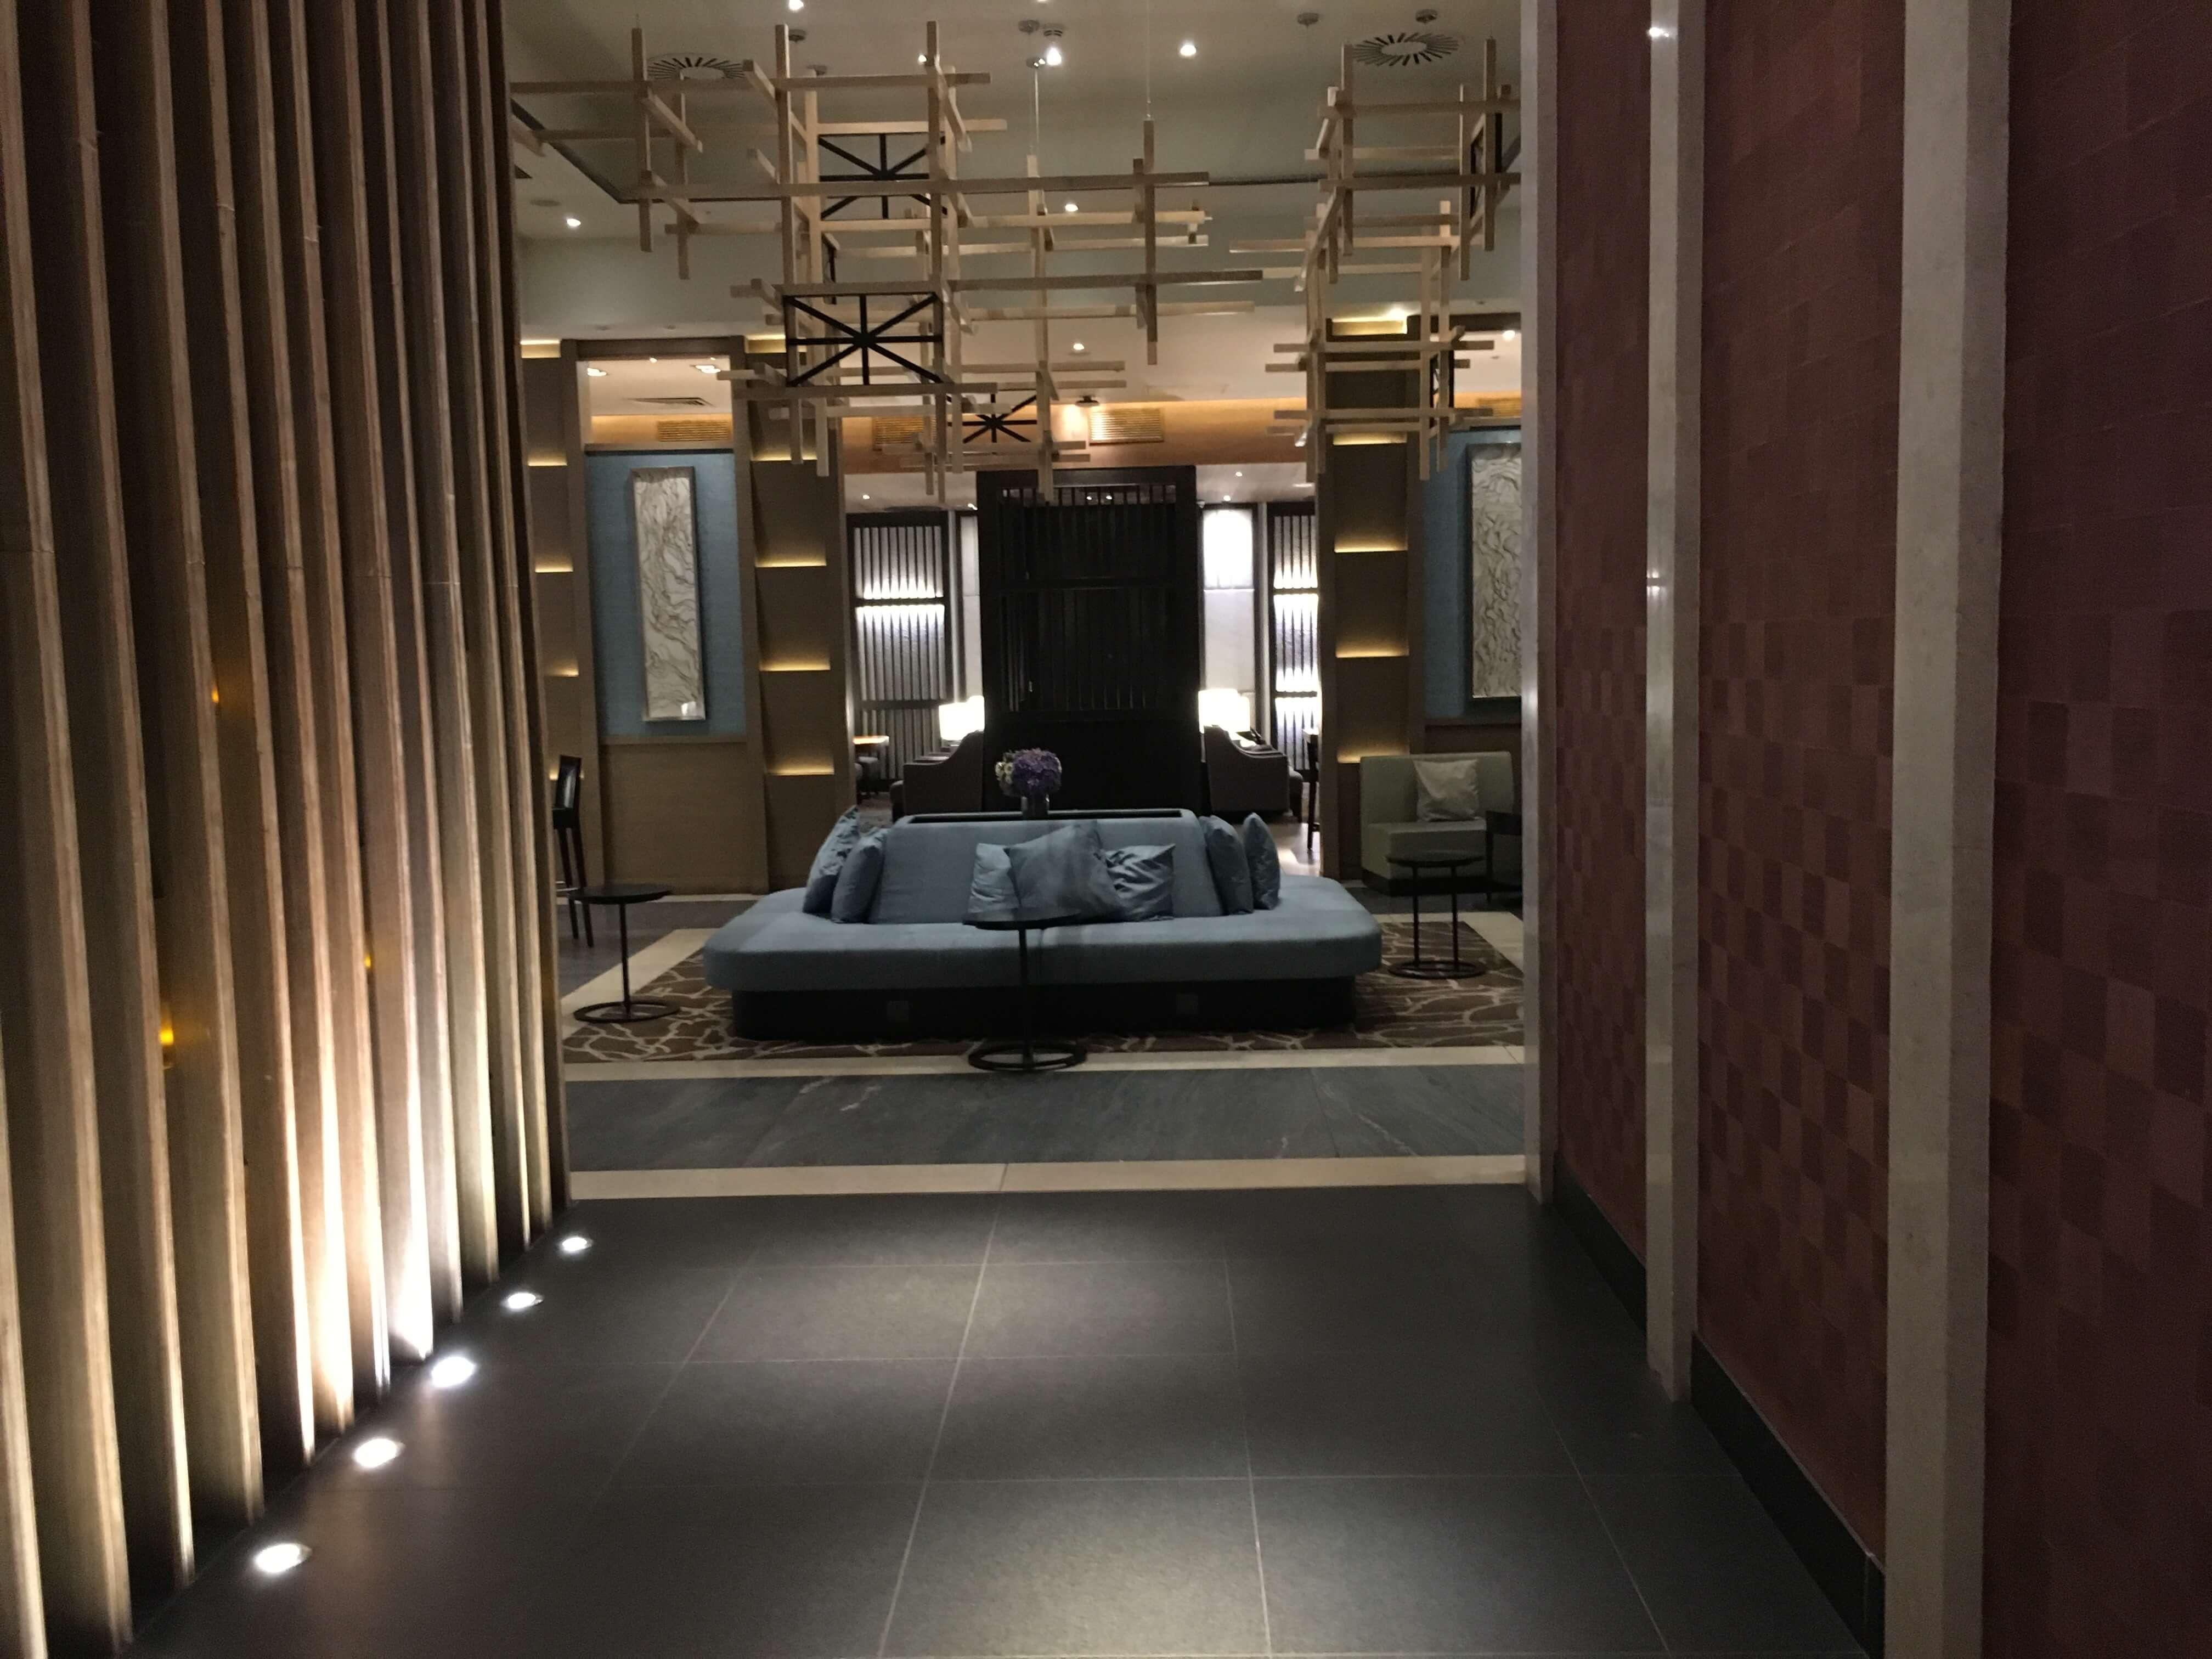 Lounge Review : ロンドン・ヒースロー(LHR)ターミナル2 Plaza Premium lounge